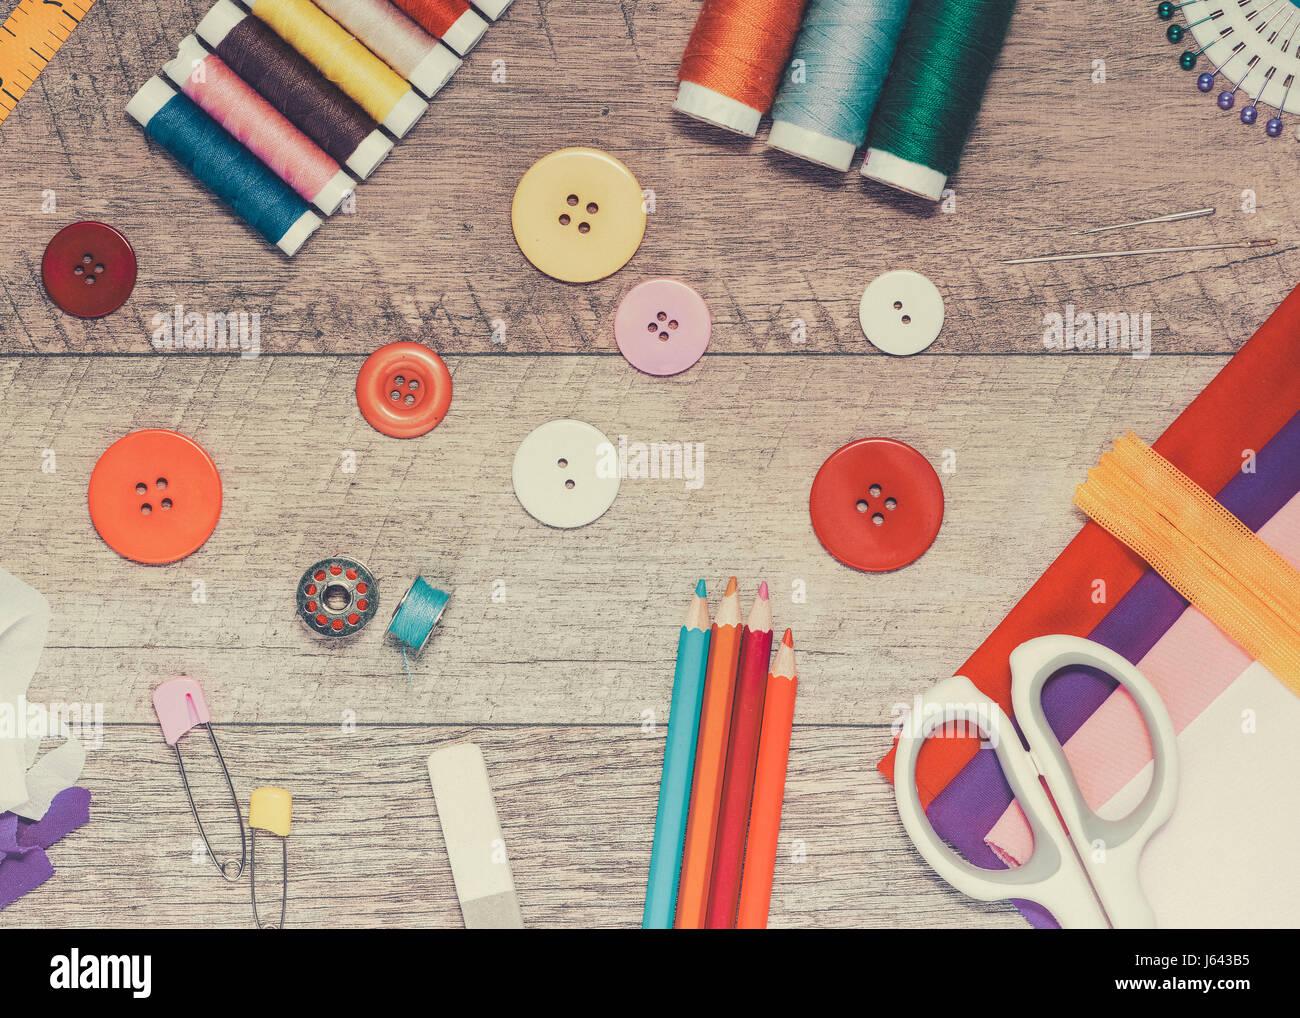 Workplace Of Fashion Designer Studio With Equipment Stock Photo Alamy